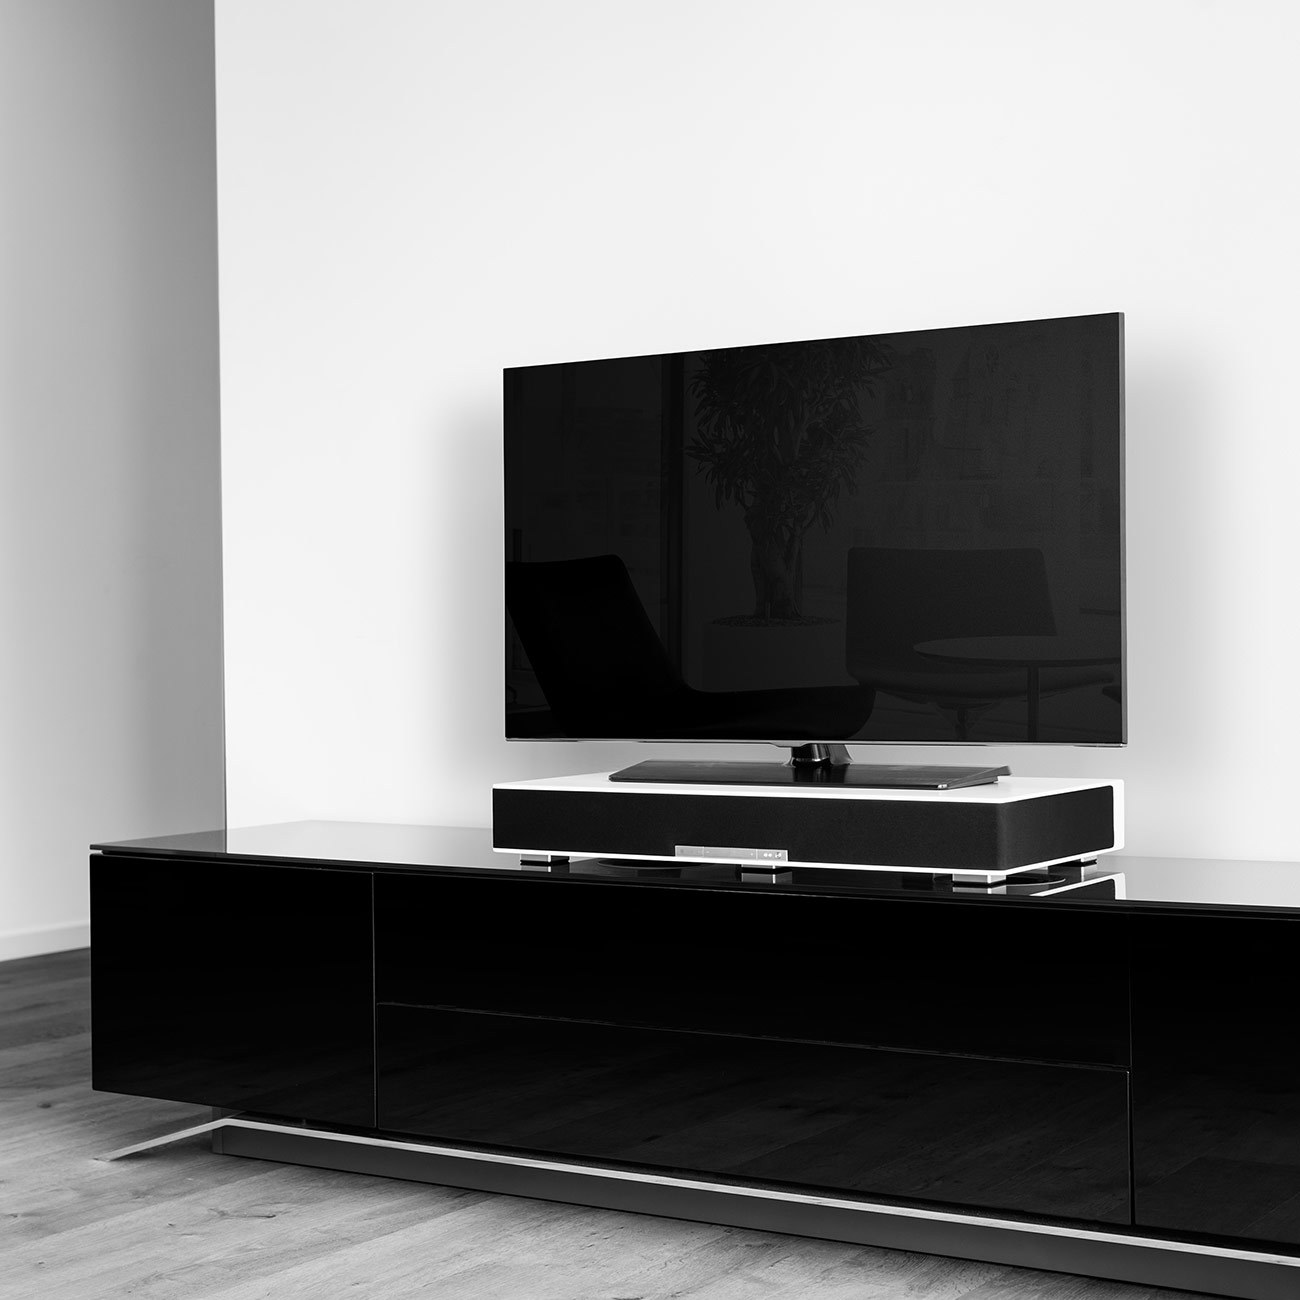 ifa 2015 raumfeld bringt netzwerklautsprecher f rs tv. Black Bedroom Furniture Sets. Home Design Ideas